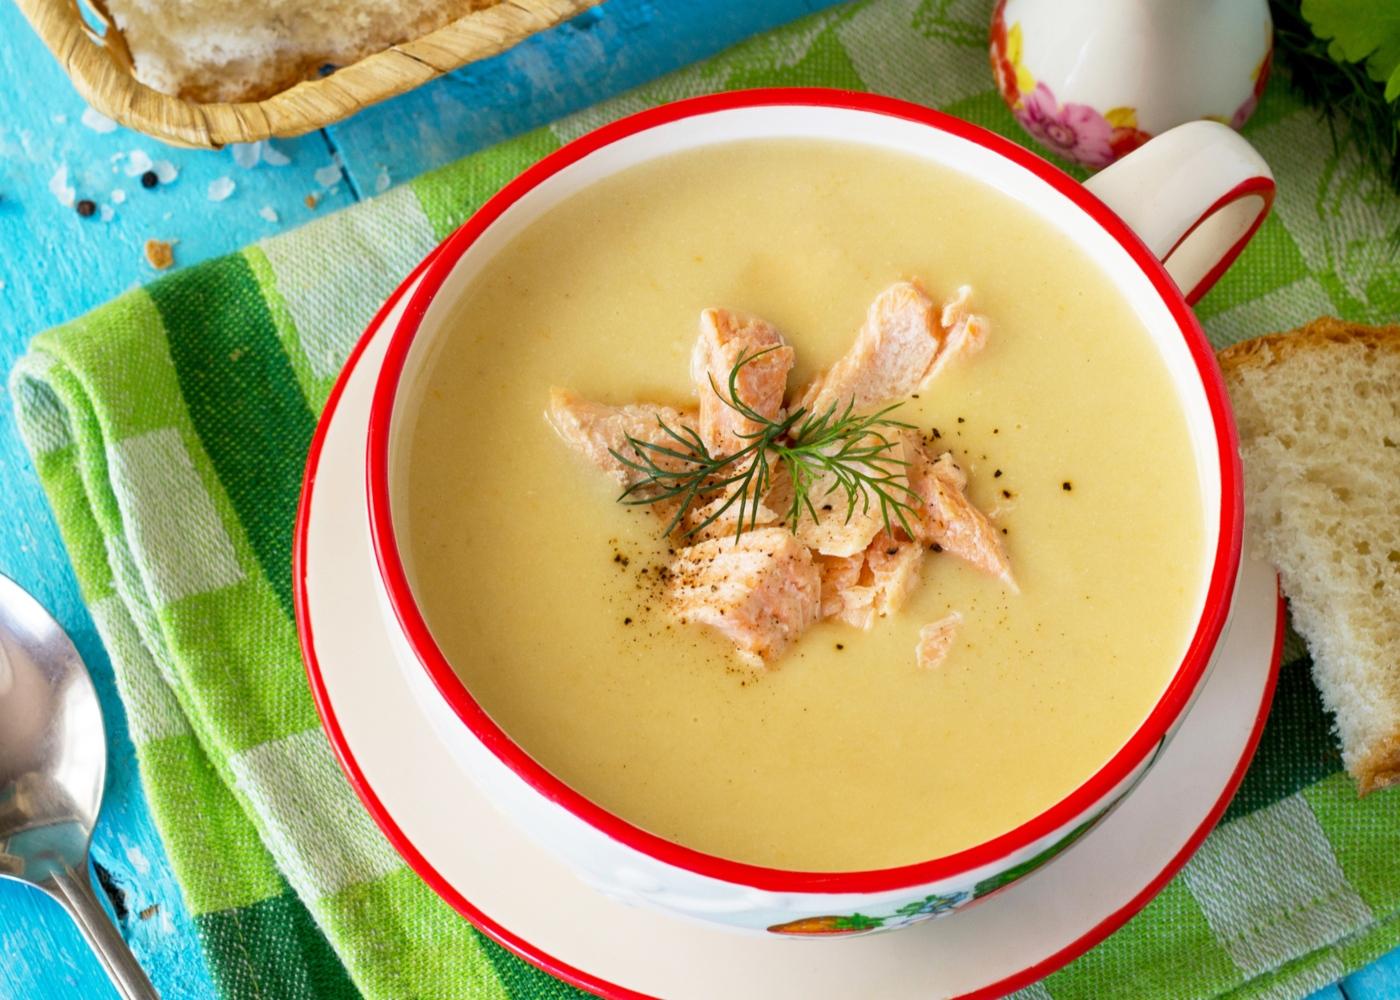 Sopa de peixe com batata e courgette